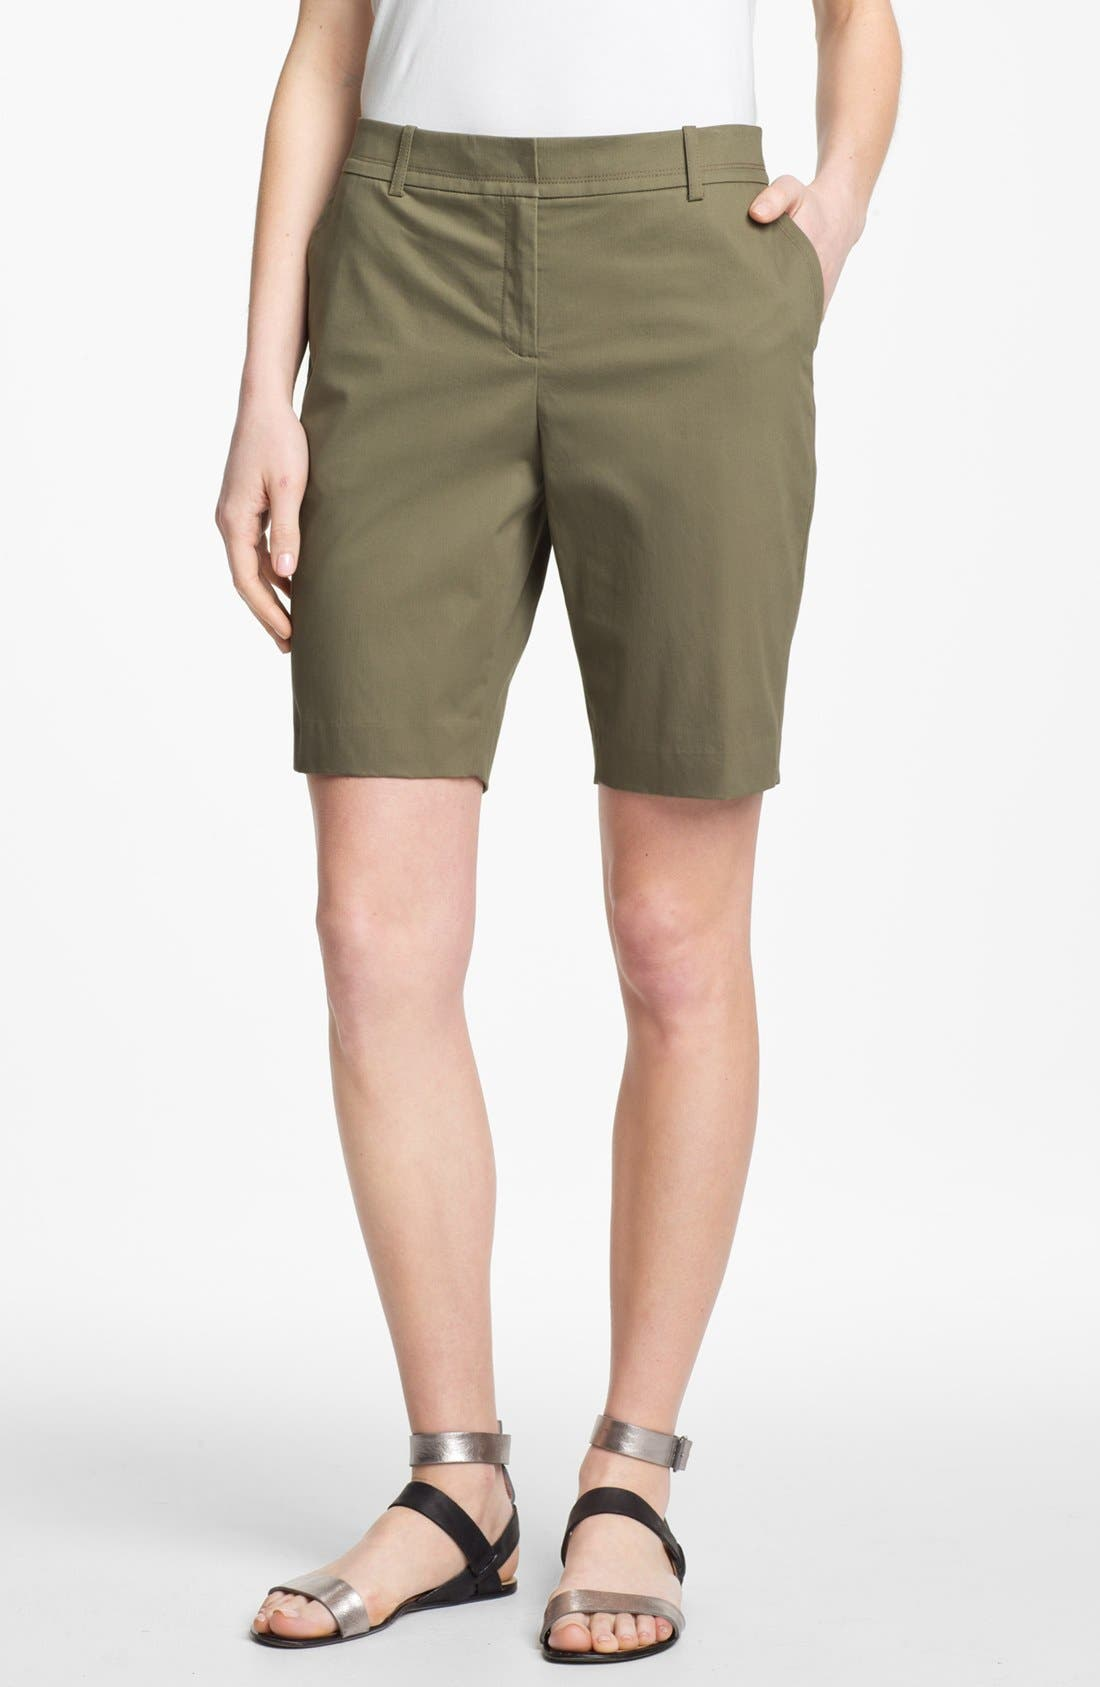 Alternate Image 1 Selected - Lafayette 148 New York Stretch Cotton Bermuda Shorts